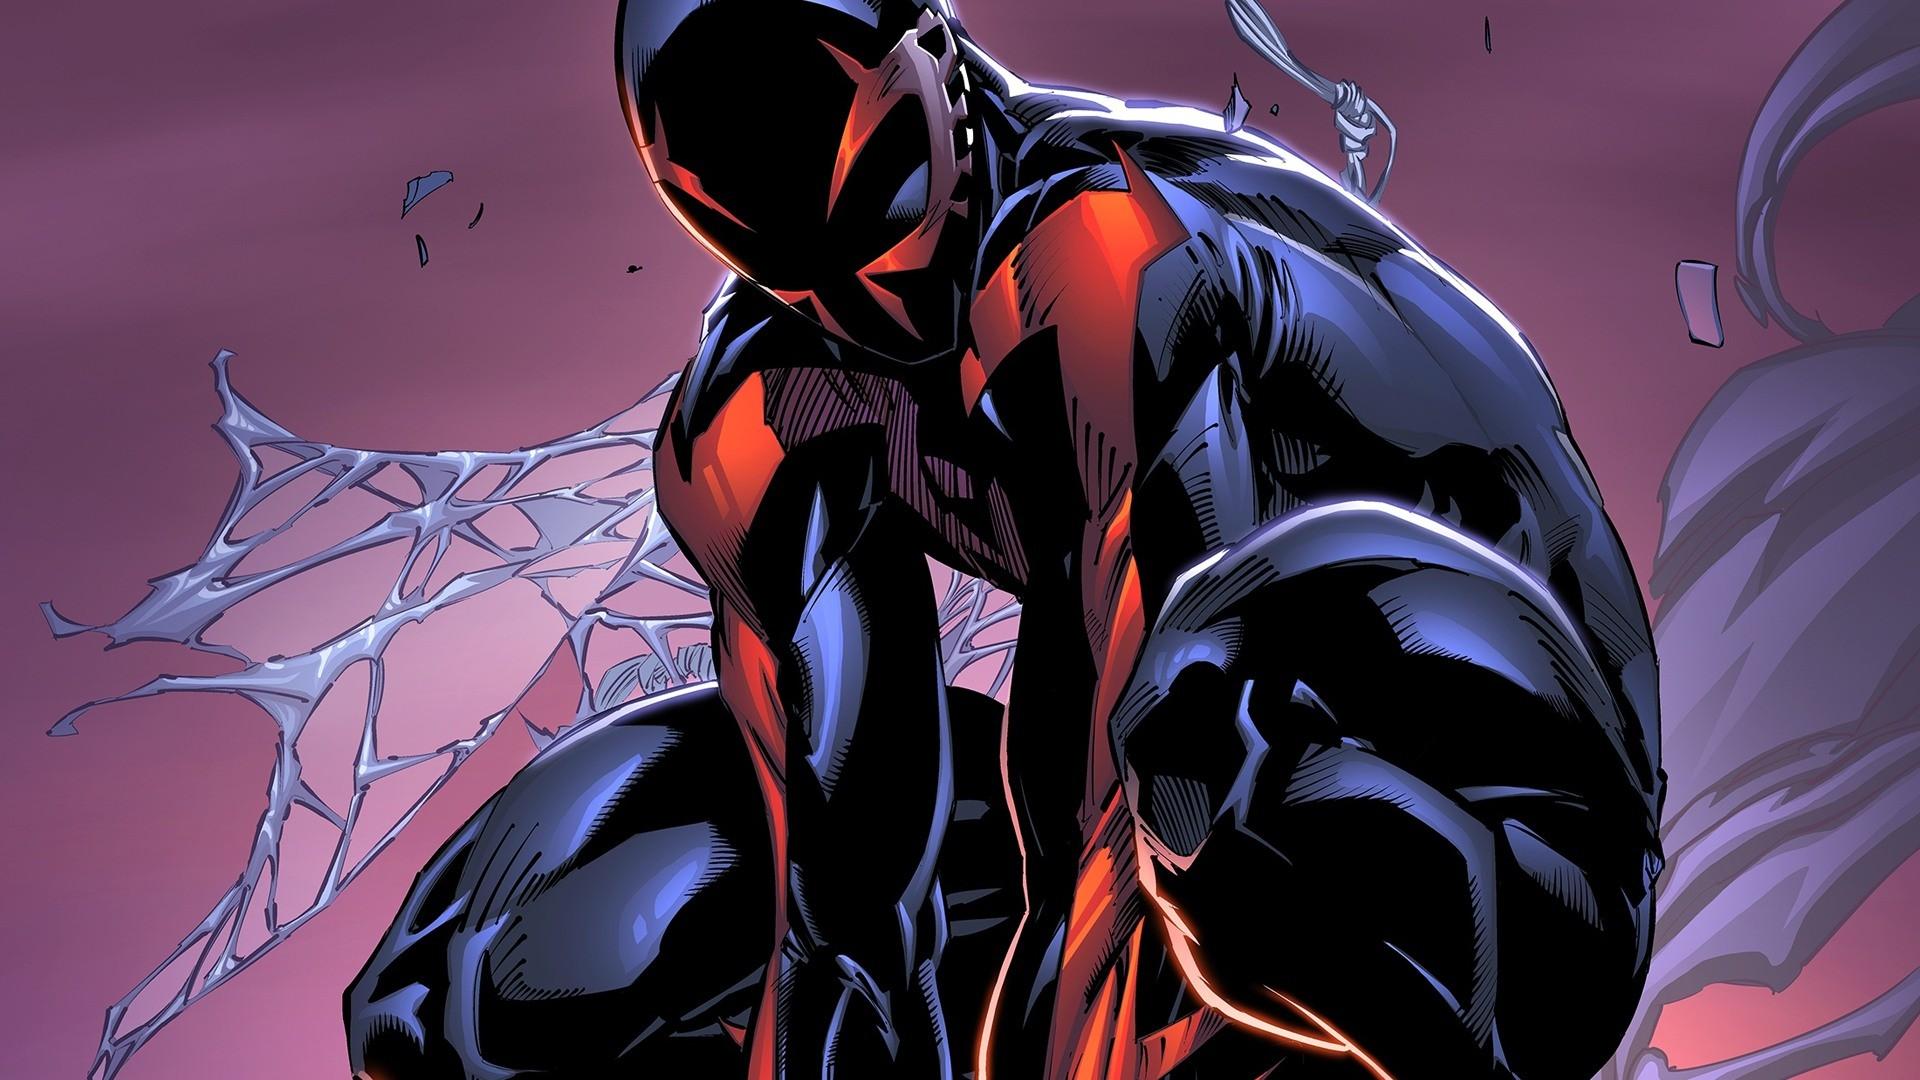 Spider Man 2099 Wallpaper On Wallpaperget Com: デスクトップ壁紙 : 図, アニメ, マーベルコミックス, 漫画, スパイダーマン2099, スクリーンショット